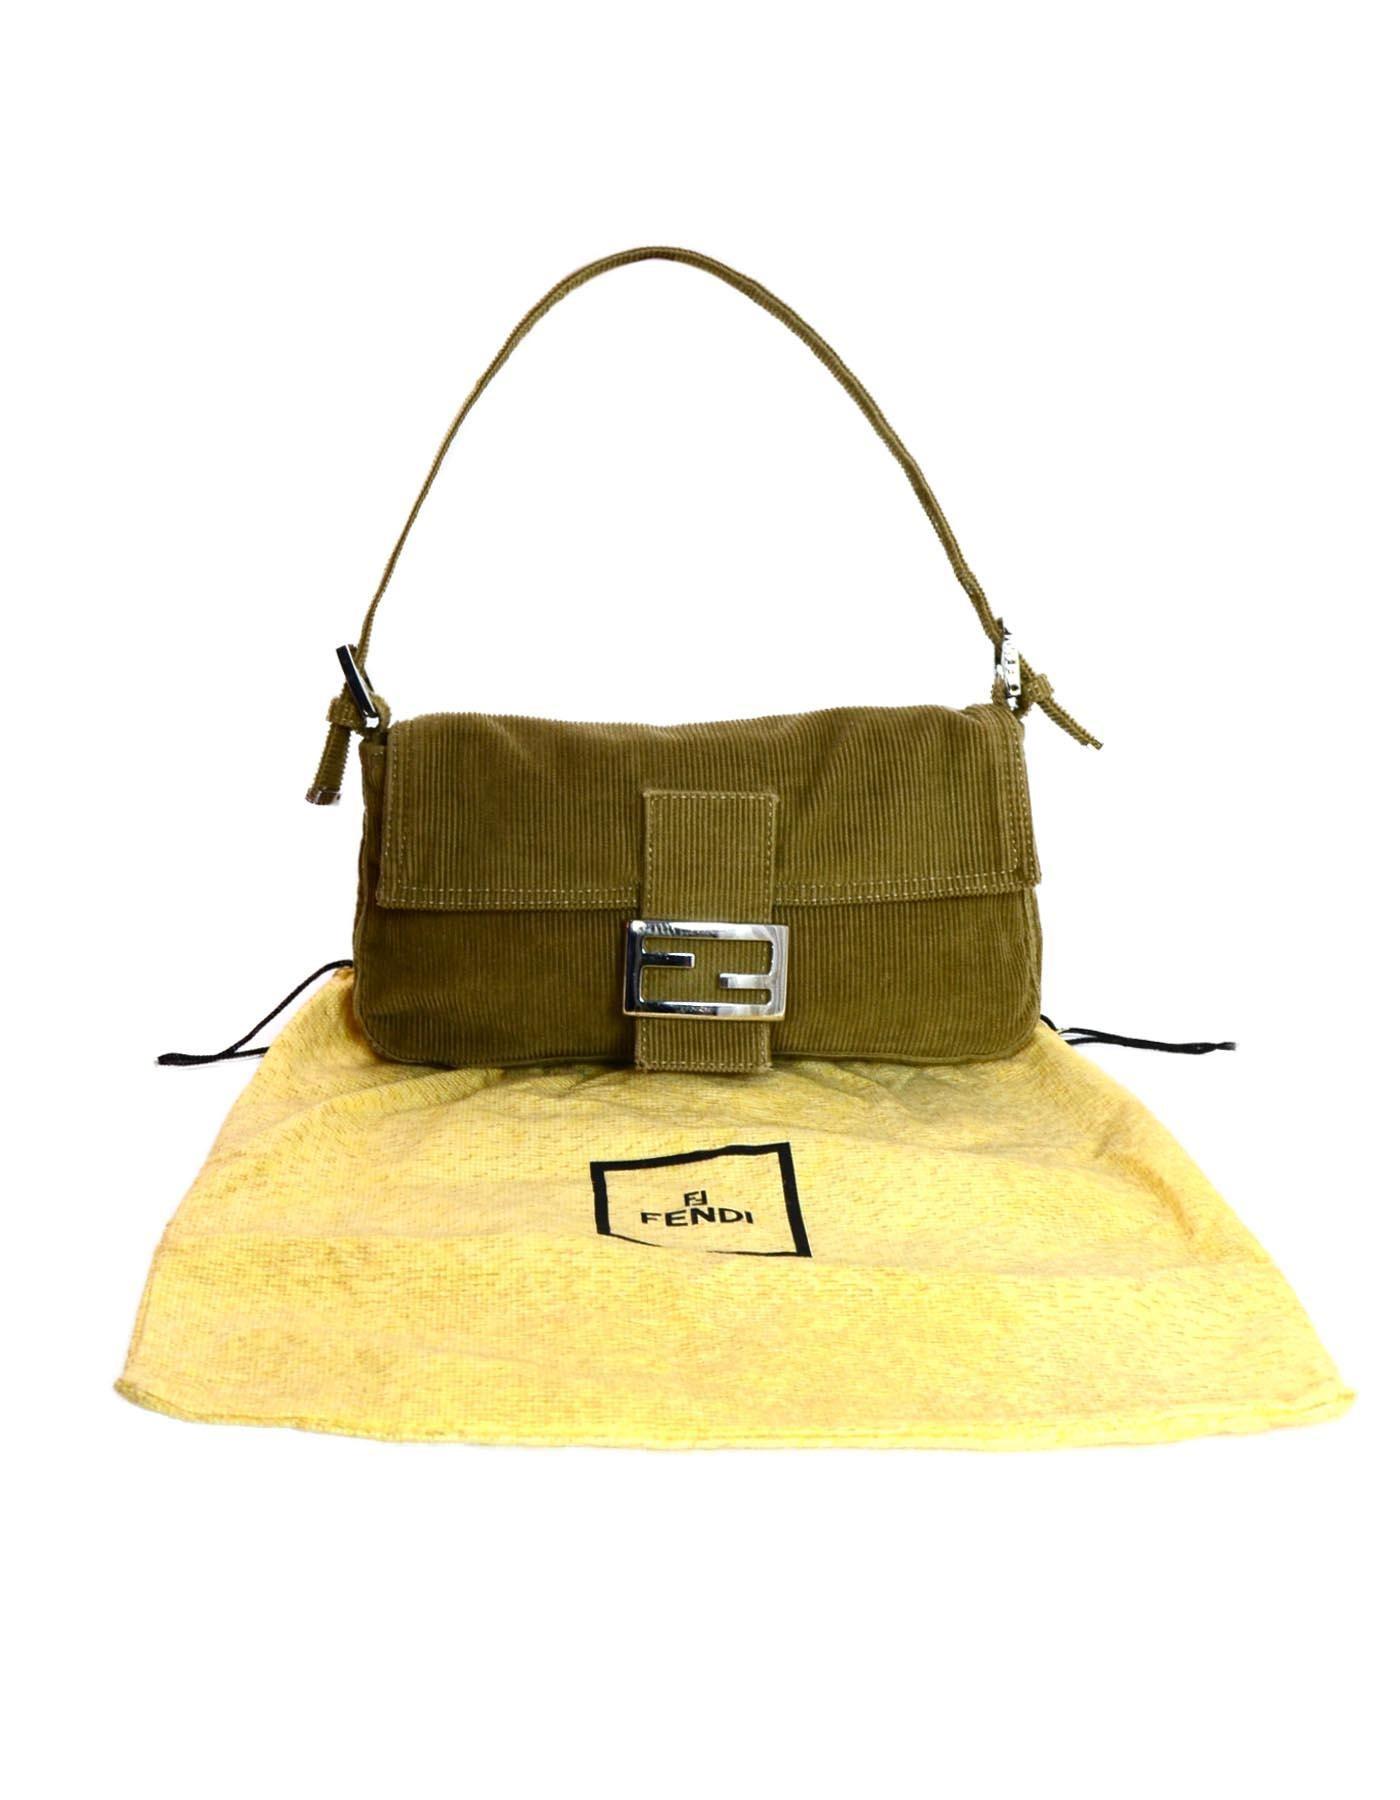 cf34aff11b29 Fendi Beige Corduroy Baguette Bag w  Silvertone Logo Buckle at 1stdibs